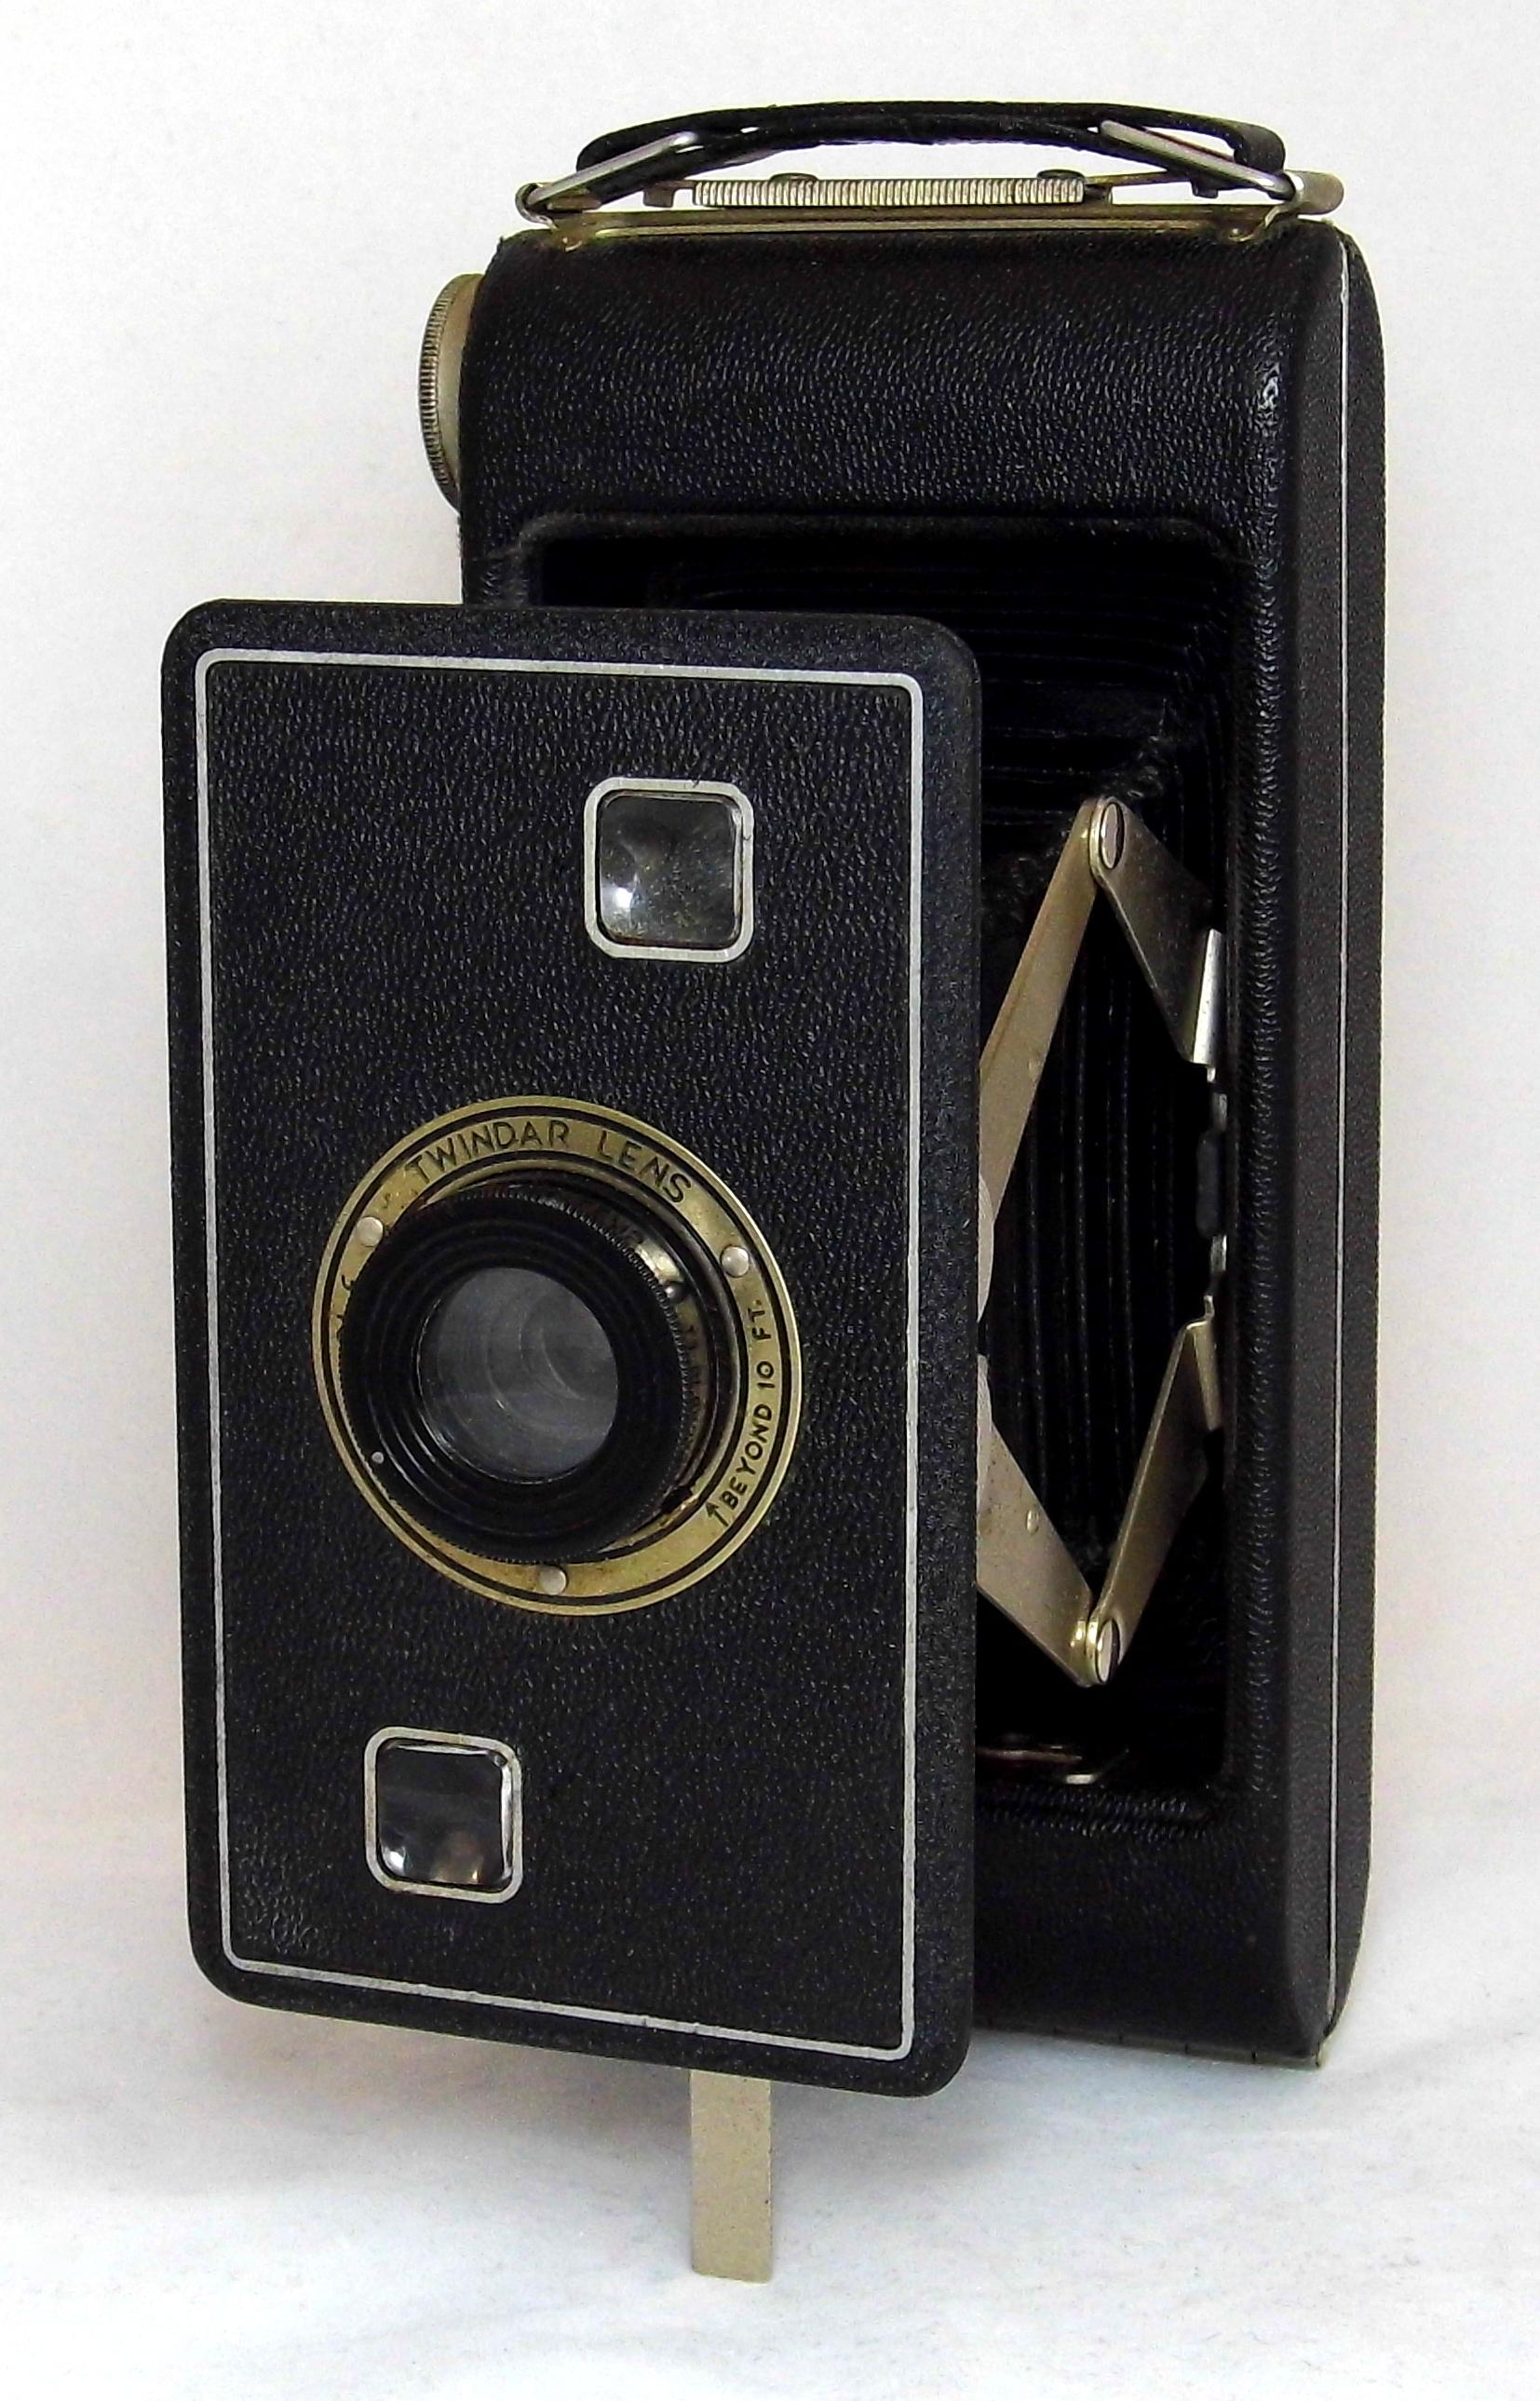 Filevintage Kodak Jiffy Six 16 Series Ii Folding Film Camera Uses